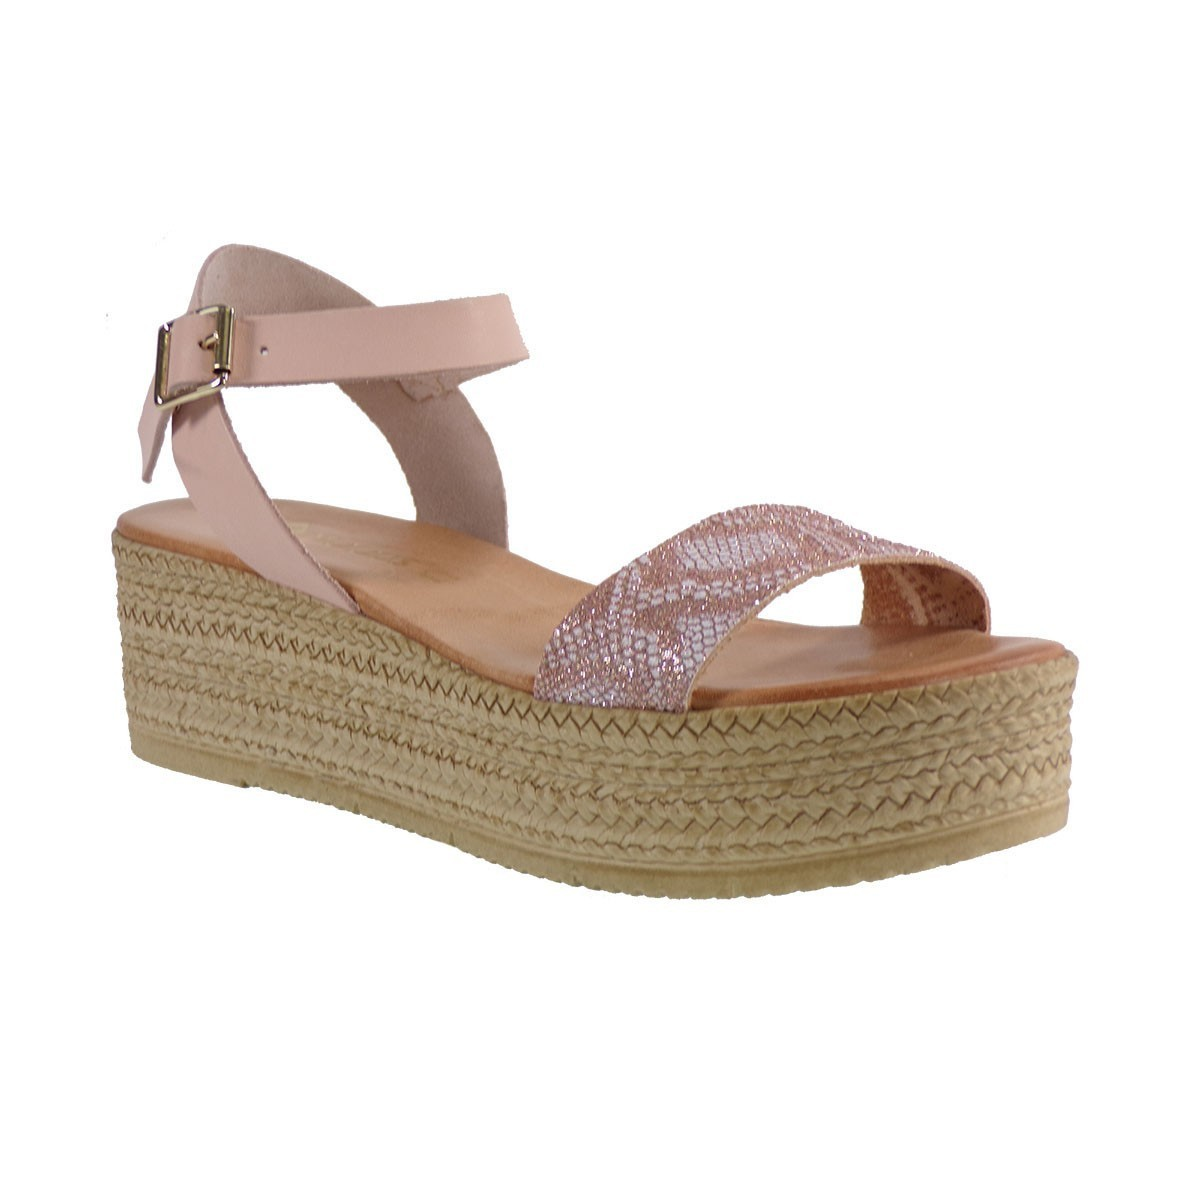 89558137a5d Moods Shoes Γυναικείες Πλατφόρμες Πέδιλα 13111 Λ.Χακλός Φίδι-Ρόζ Δέρμα